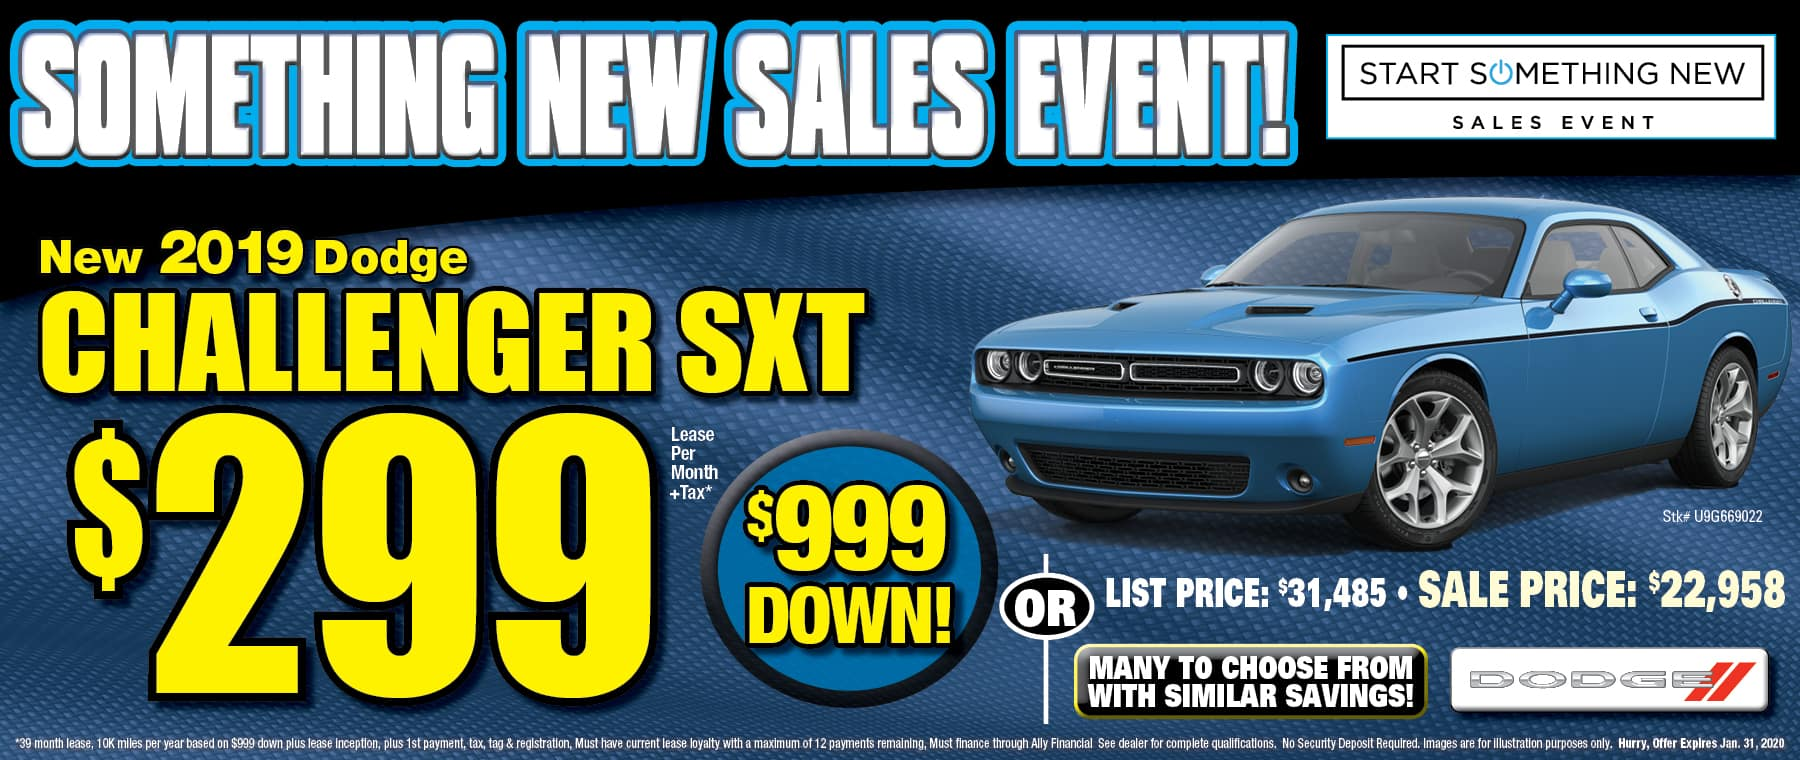 New Dodge Challenger SXT!